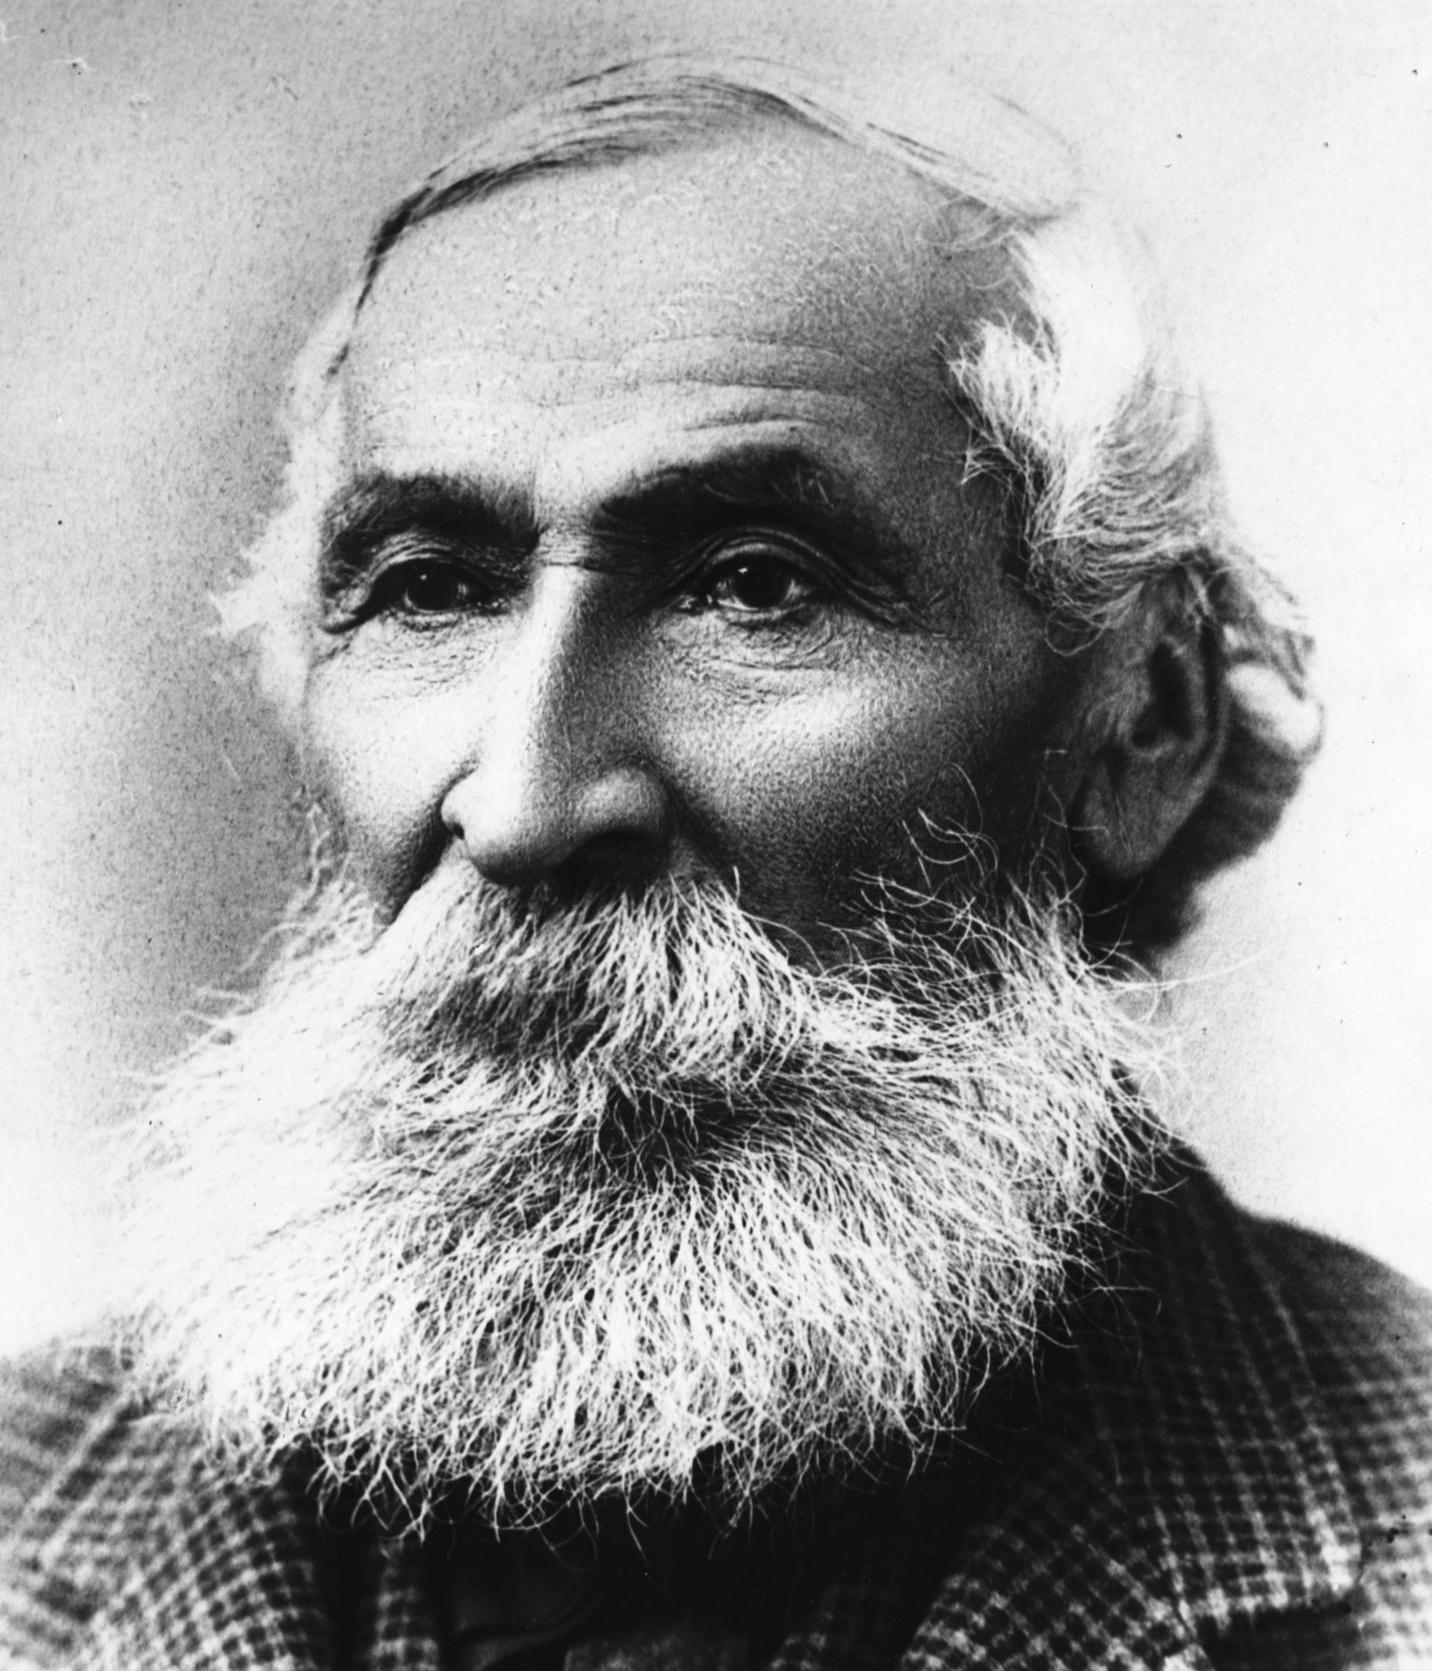 Pierre Bottineau as an old man